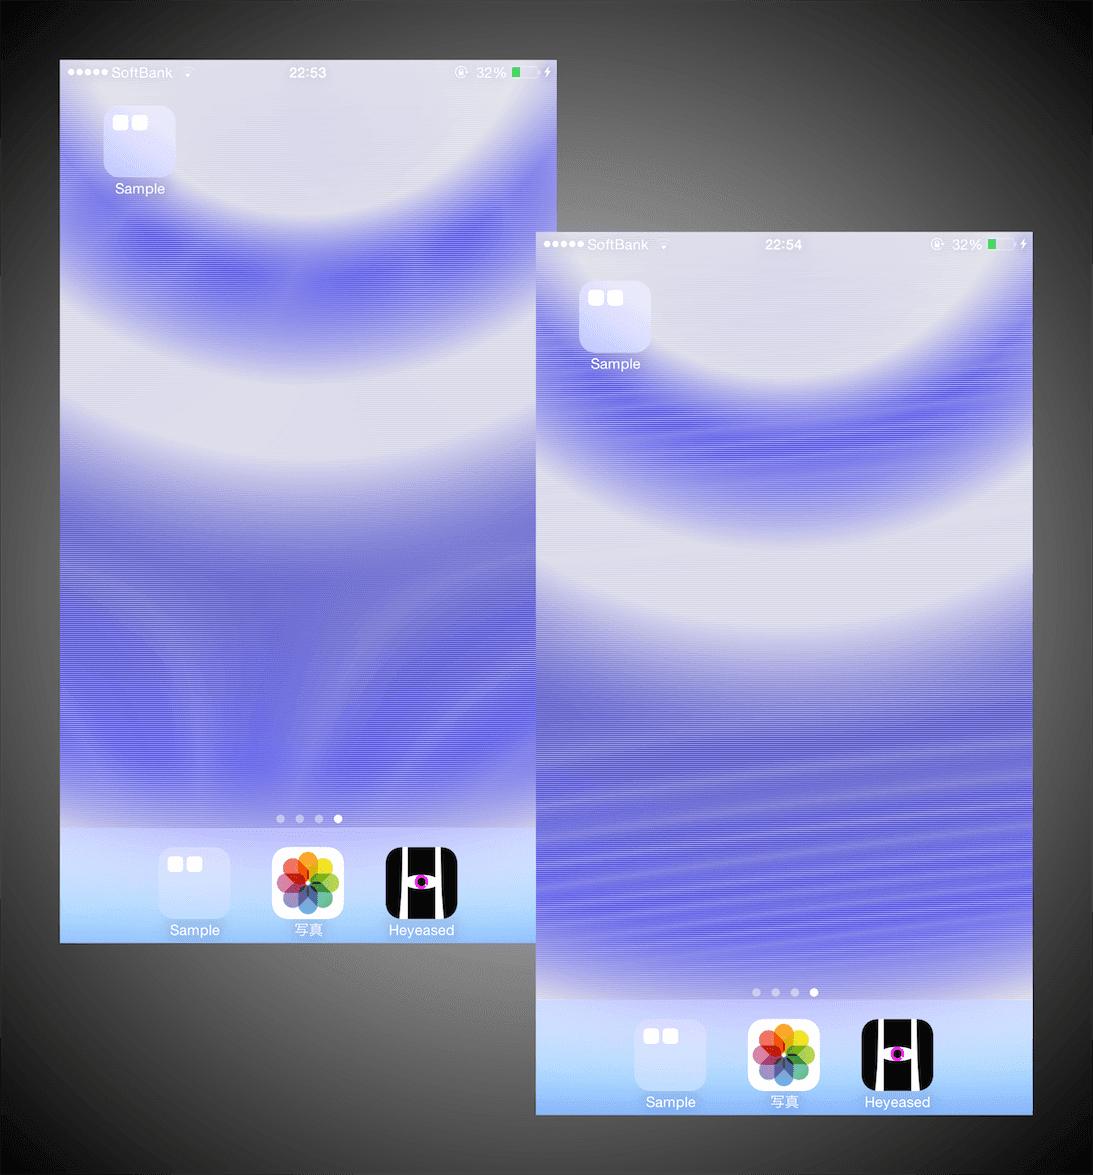 Iphoneを脱獄しなくても雲が動く空の壁紙 不思議なiphone壁紙のブログ